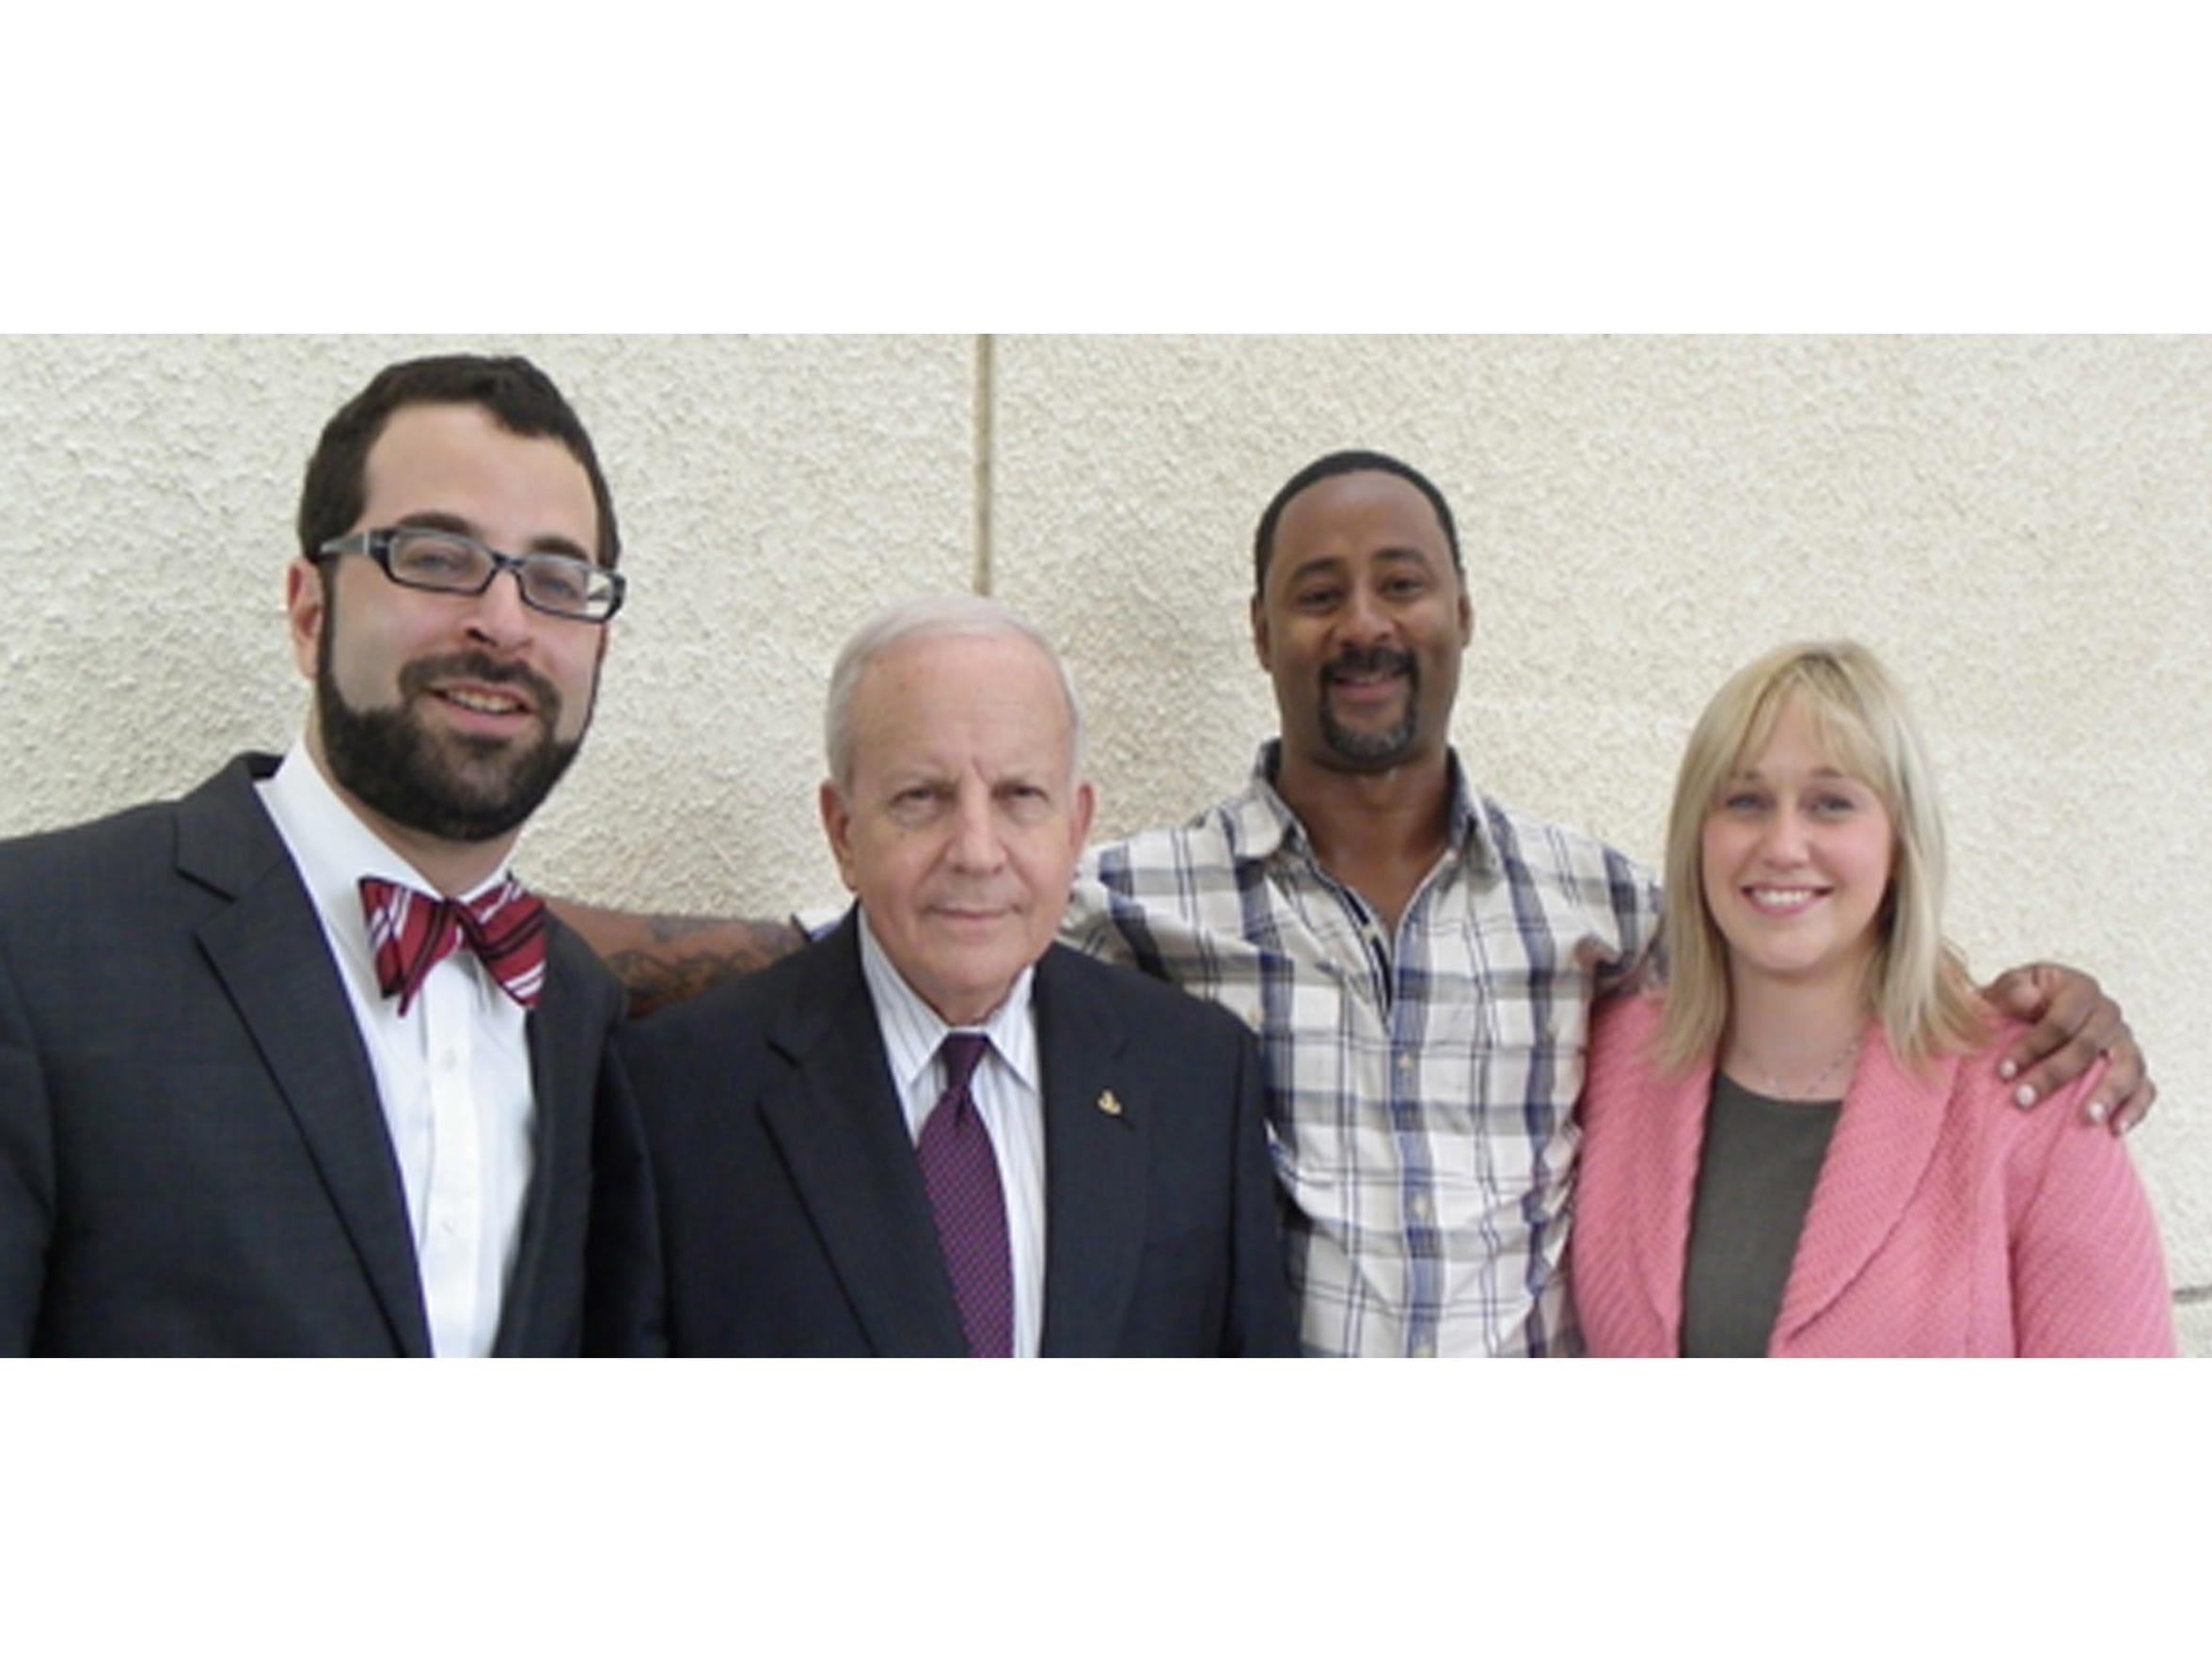 Seth Miller, far left, and Melissa Montle, far right,